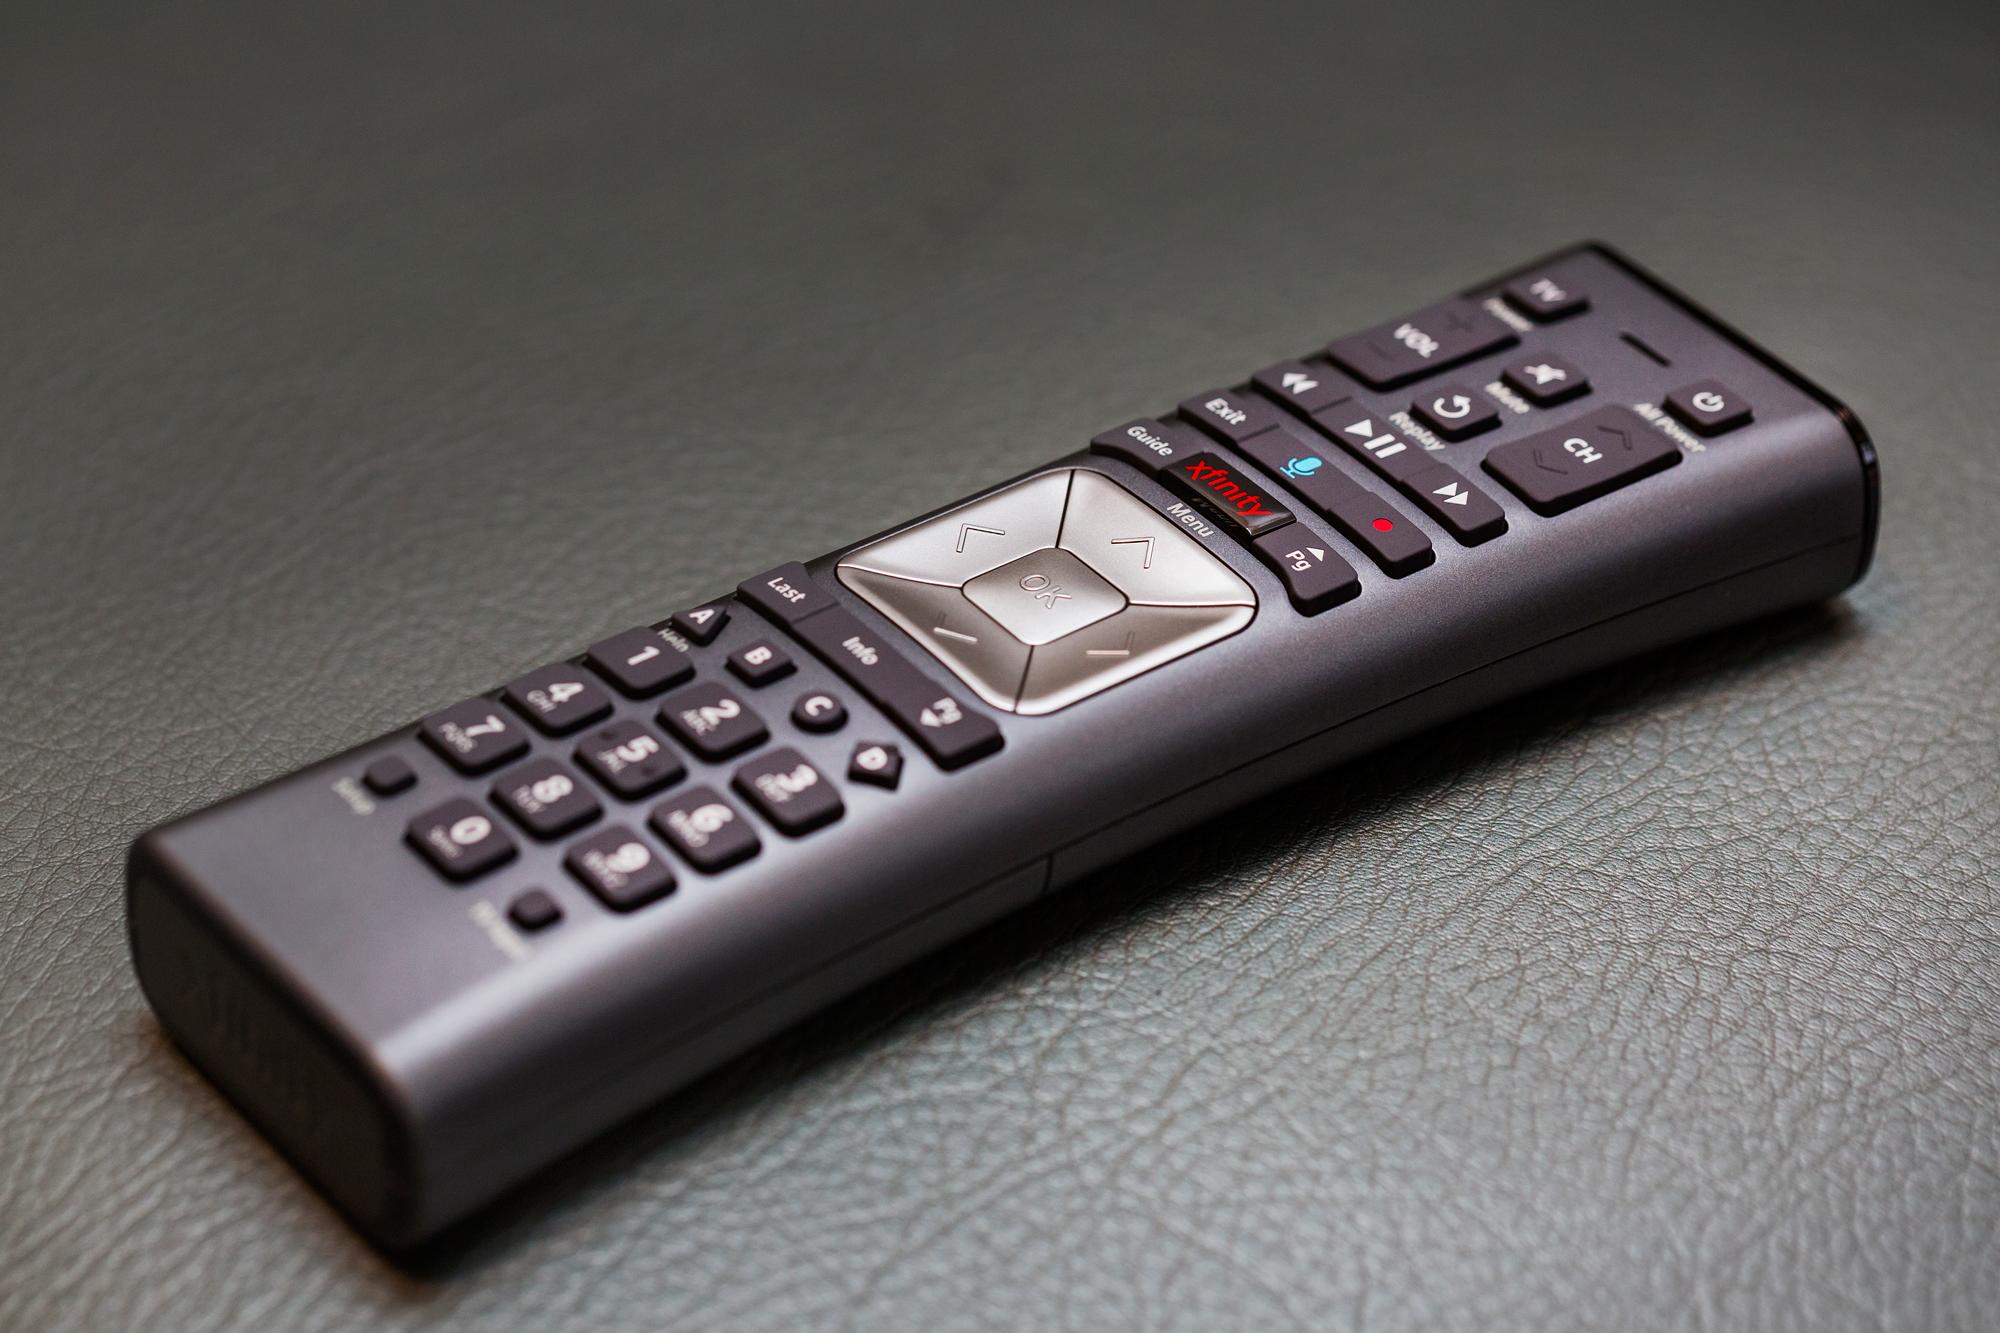 Cox Dvr remote Control manual